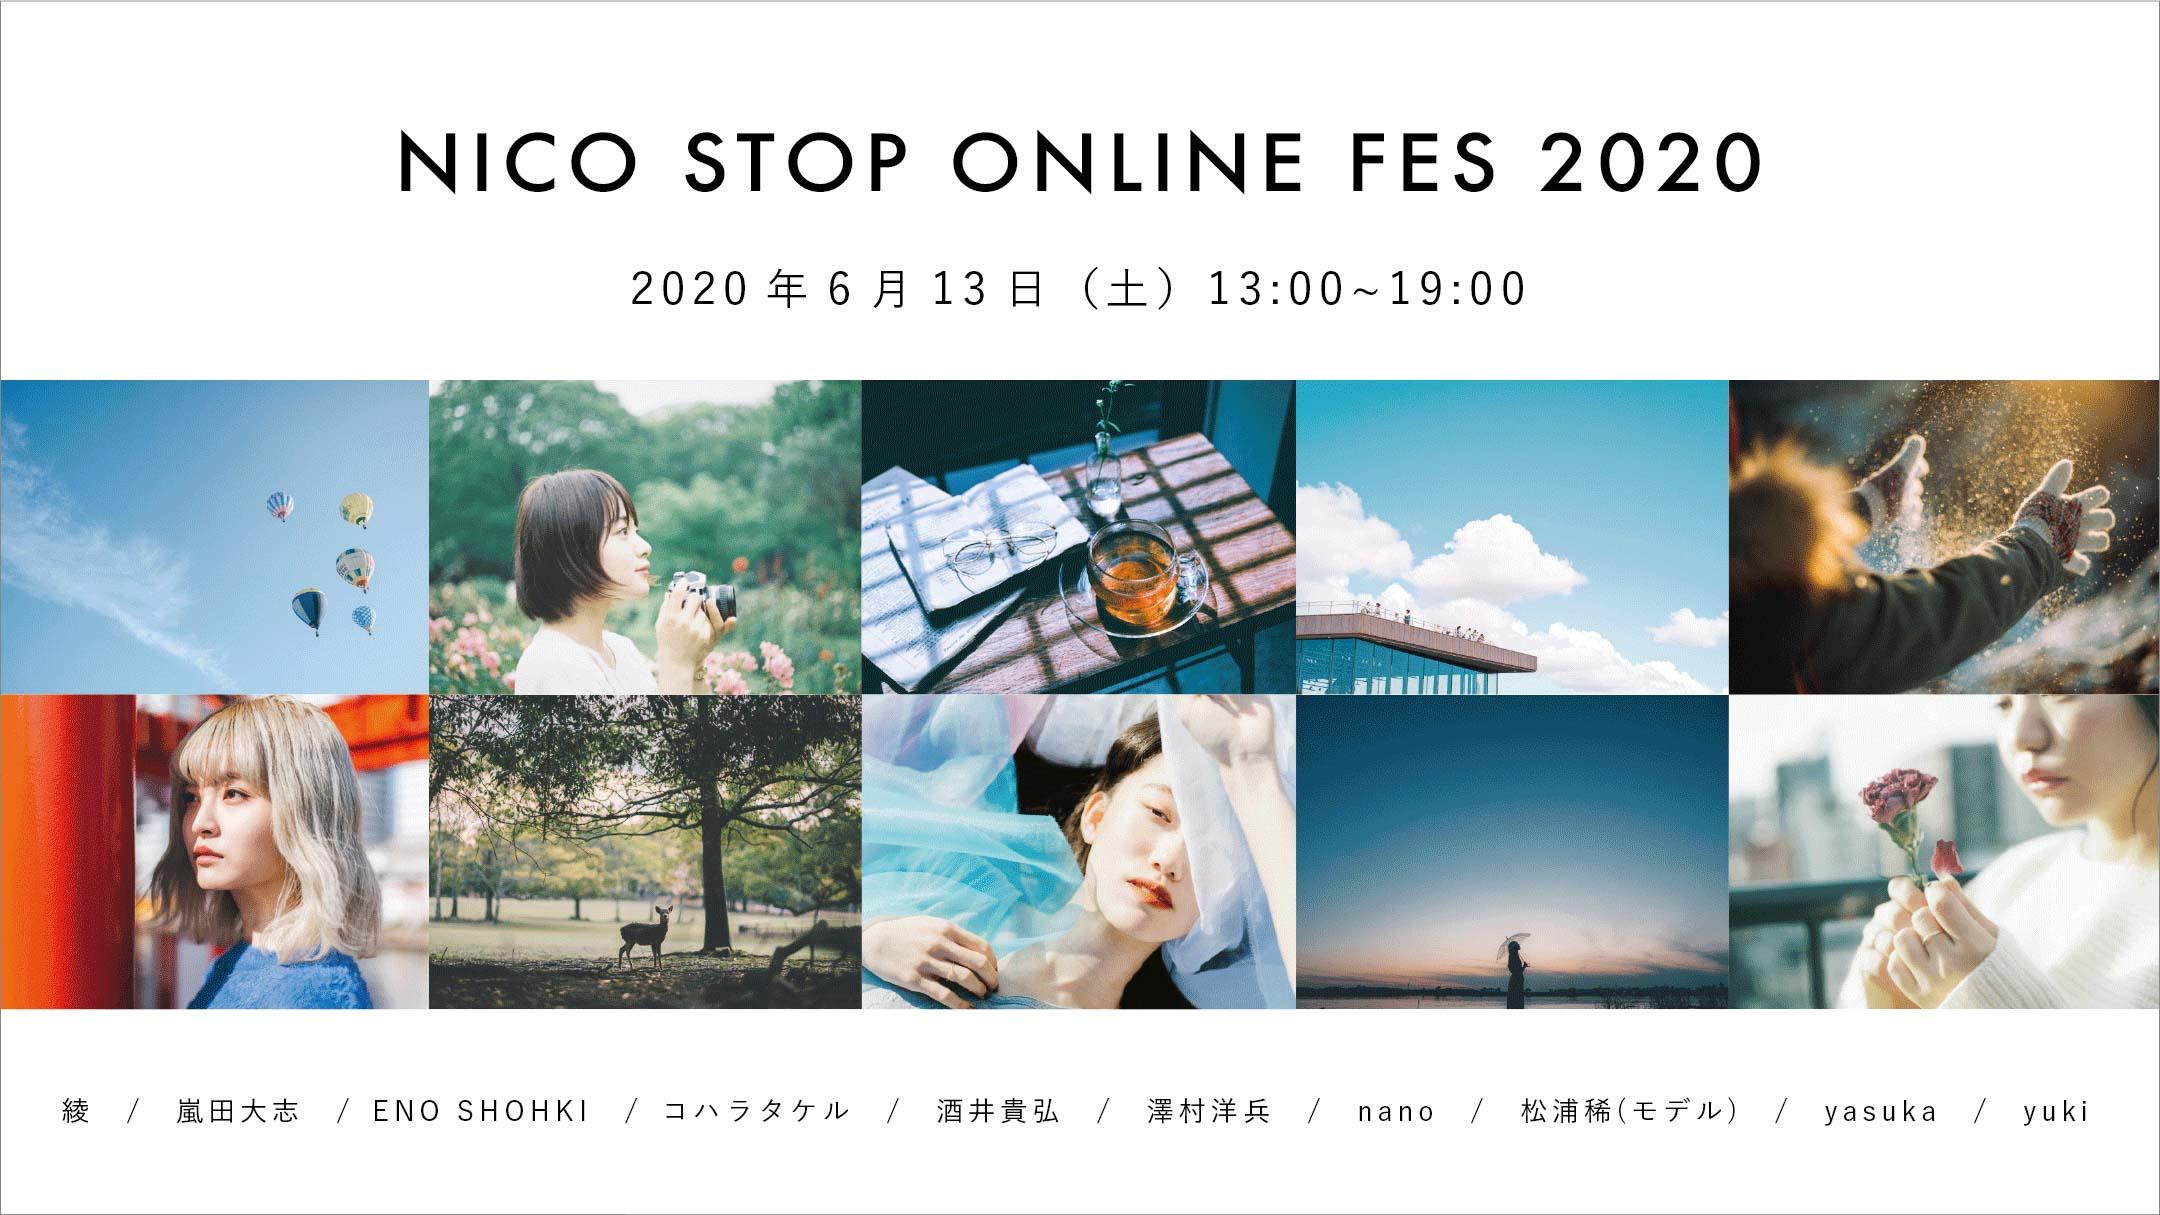 NICO STOPオンラインフェス2020